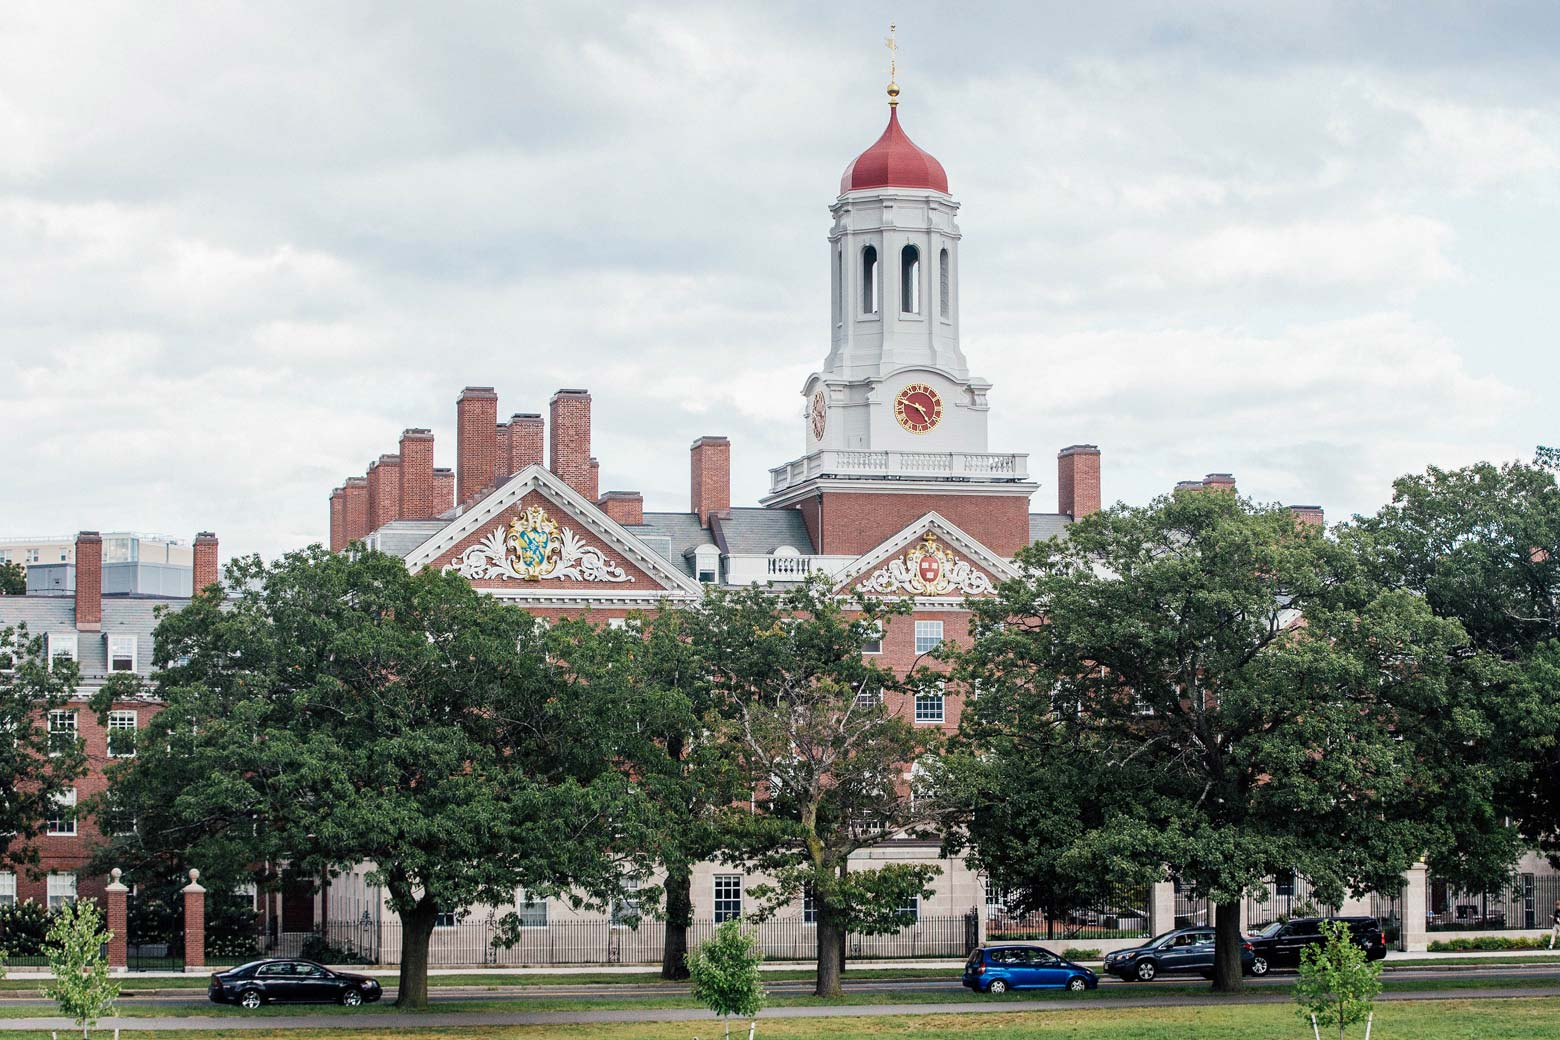 A Harvard University building in Cambridge, Massachusetts on Aug. 30.